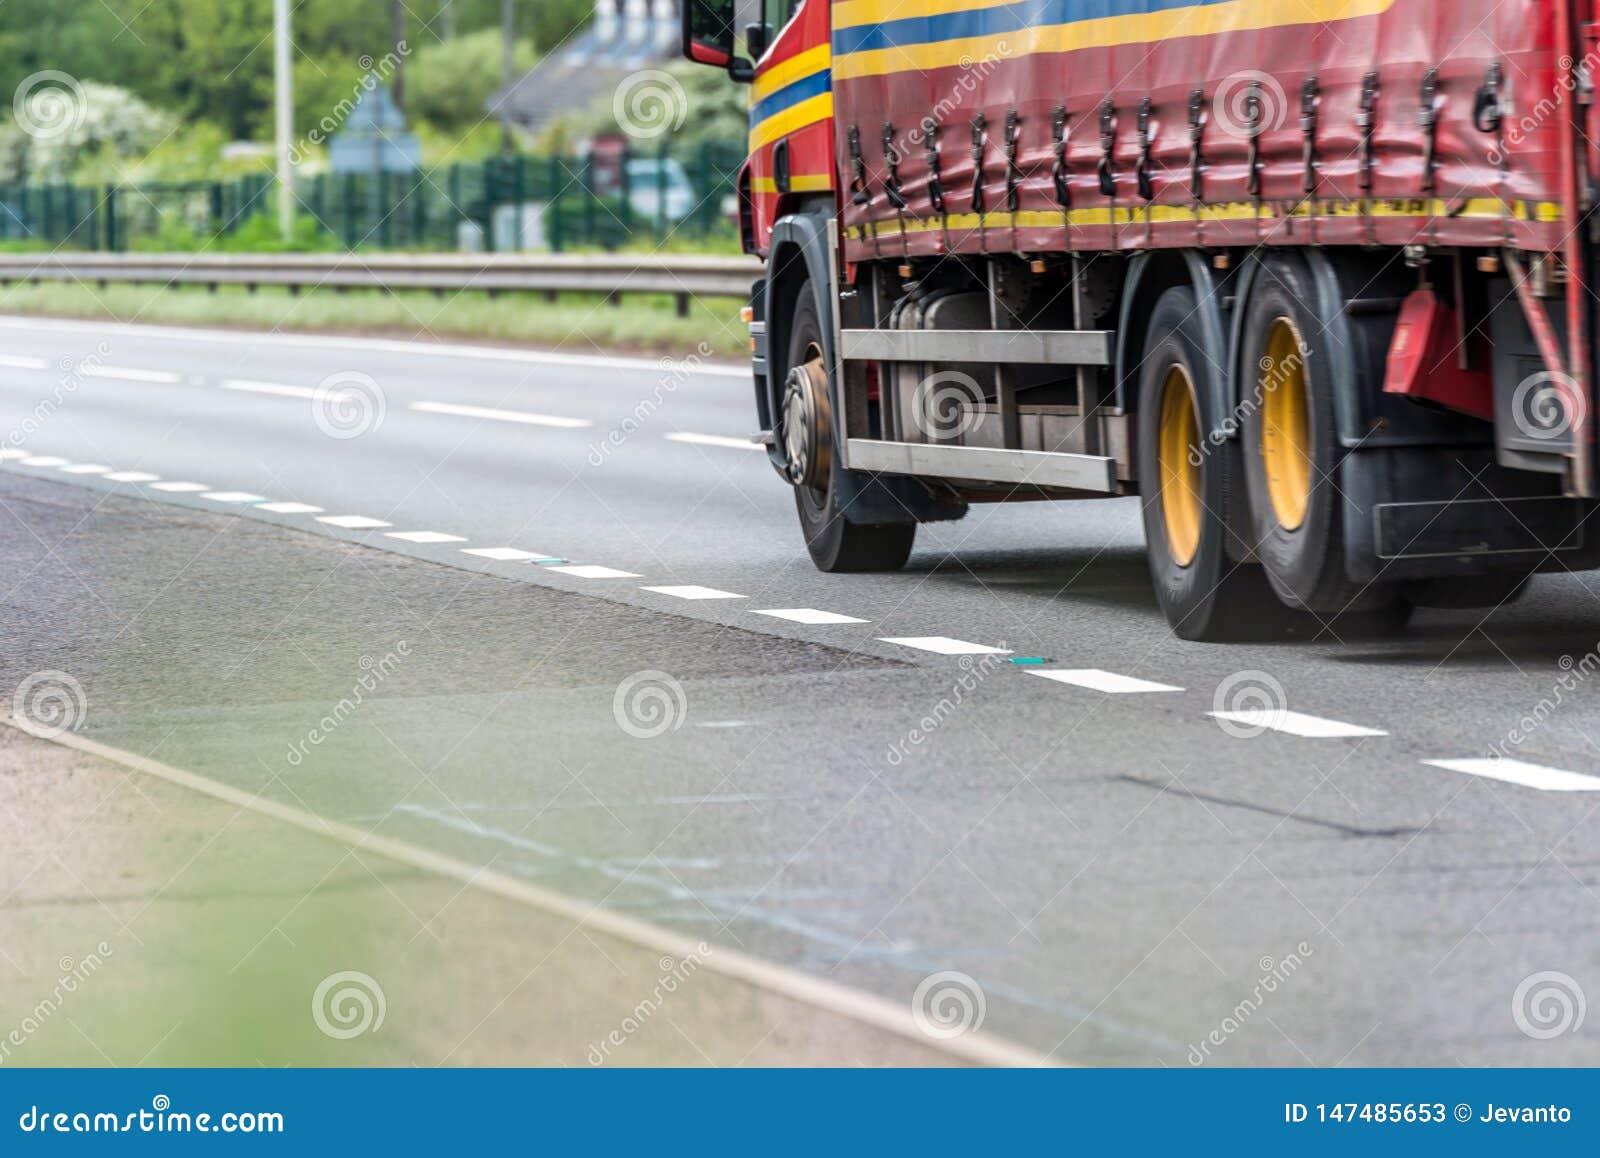 Curtain side truck on uk motorway in fast motion